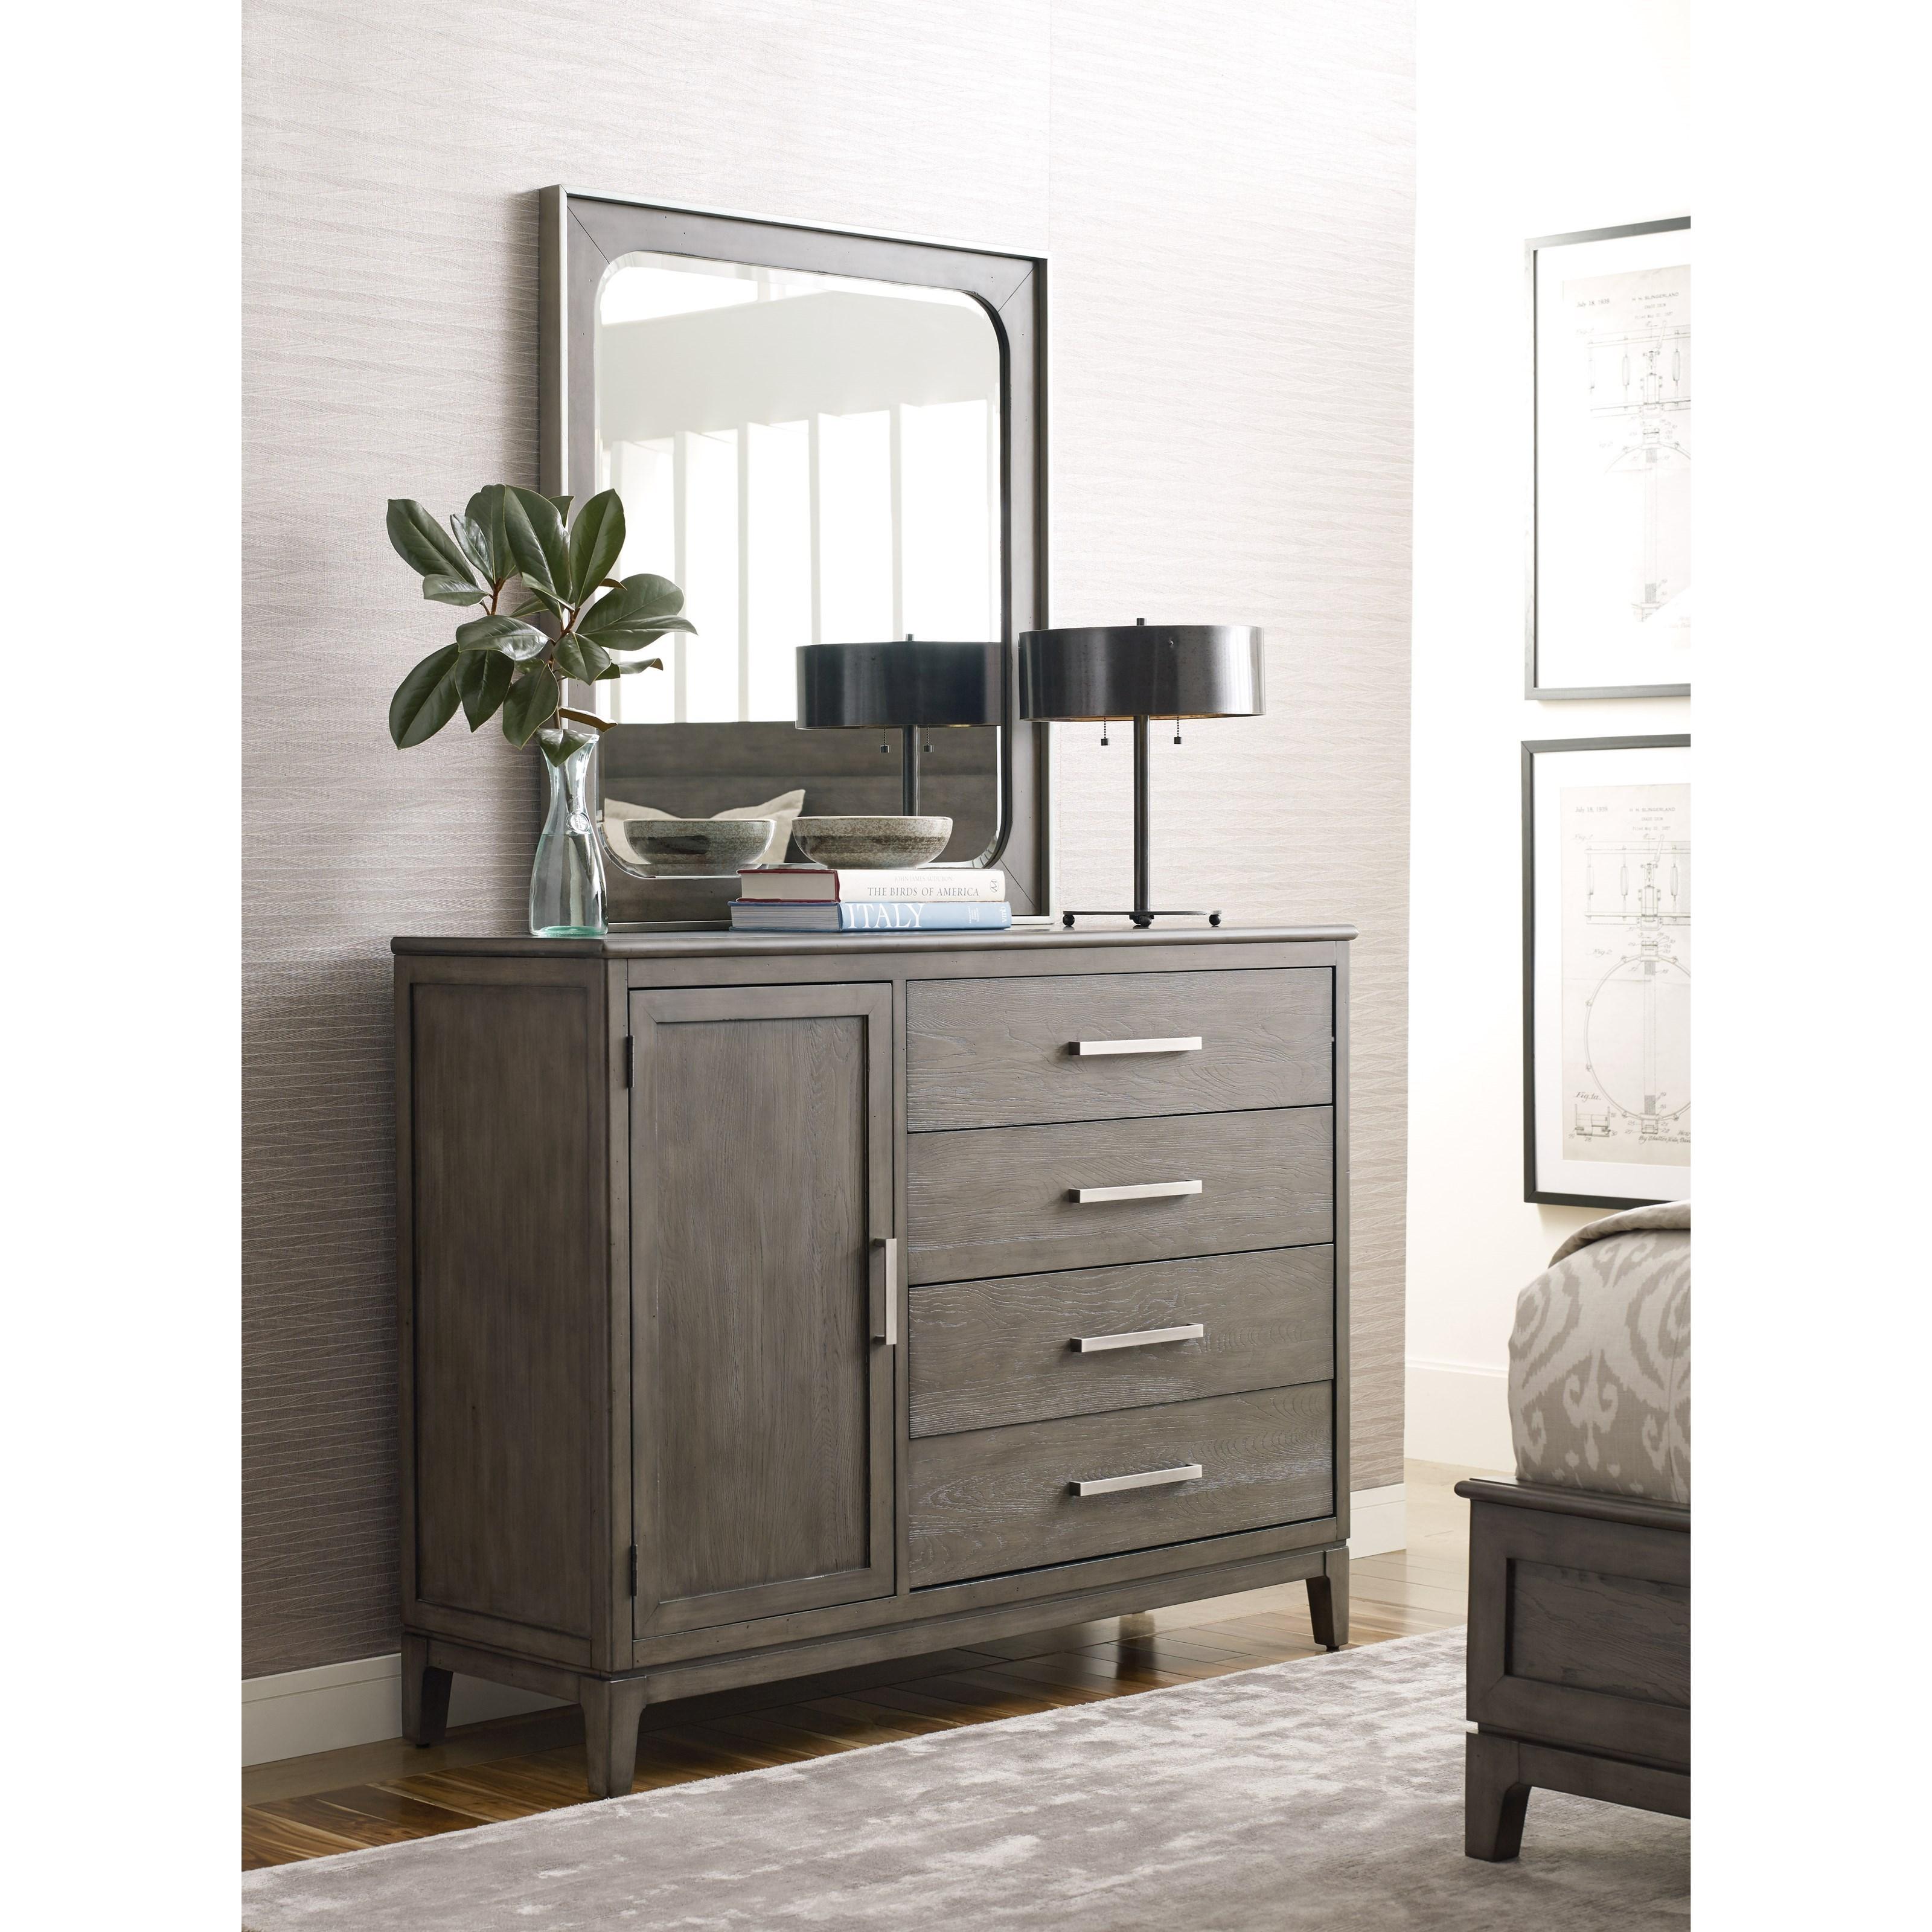 Cascade Garrison Door Bureau and Mirror Set by Kincaid Furniture at Johnny Janosik